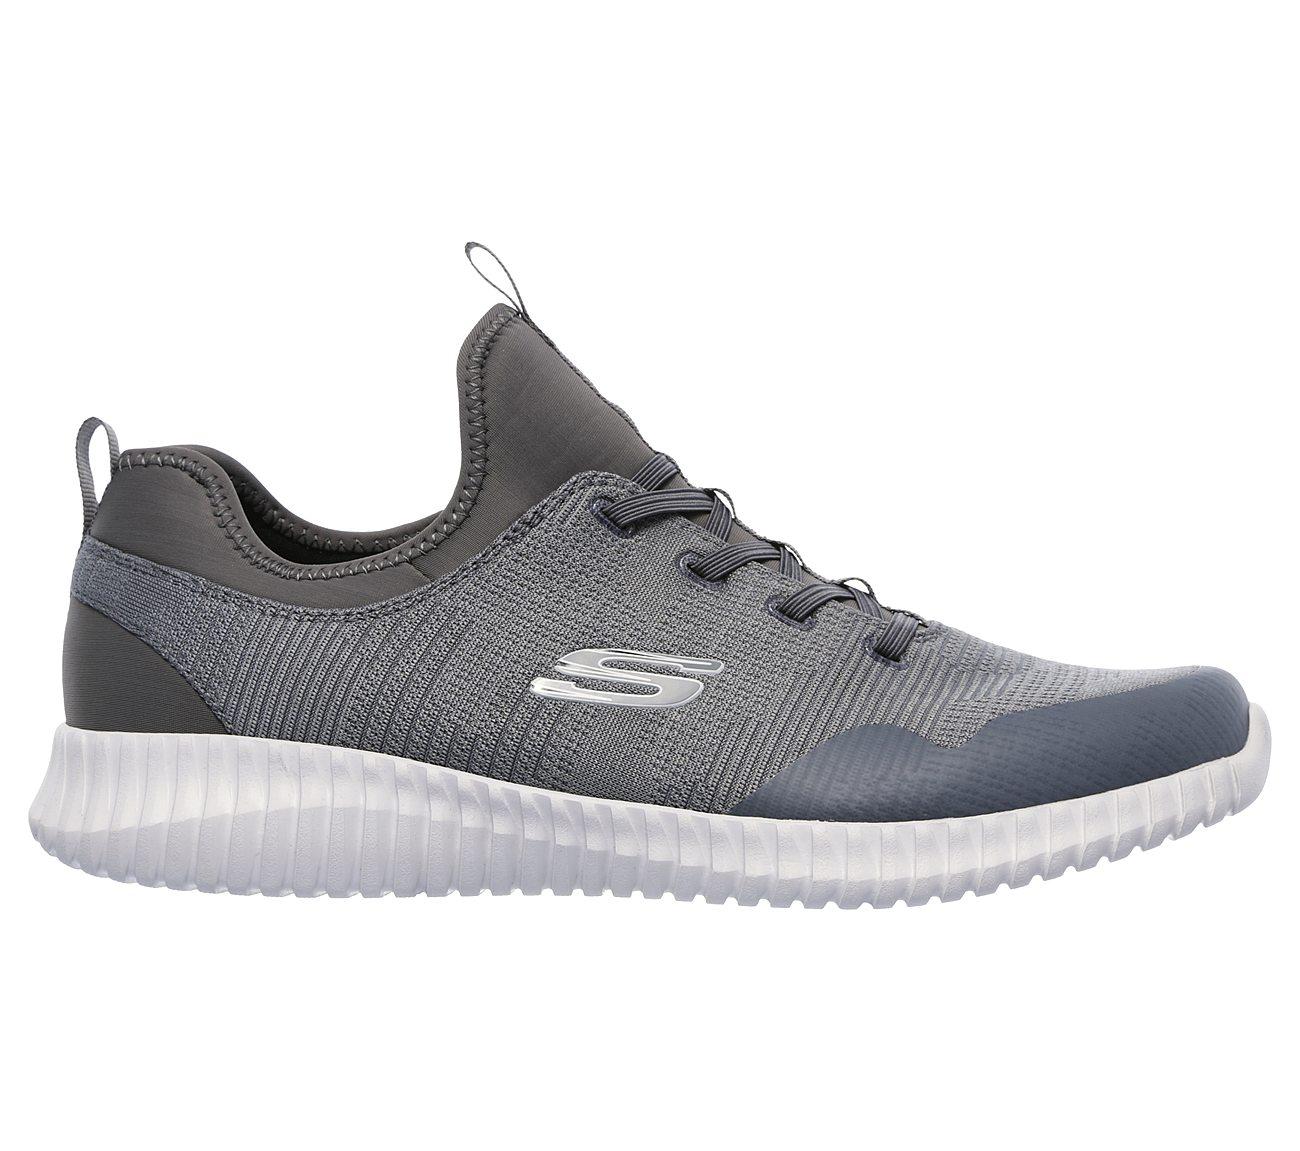 Chaussures sport femme Skechers Flex grises avec semelle Air